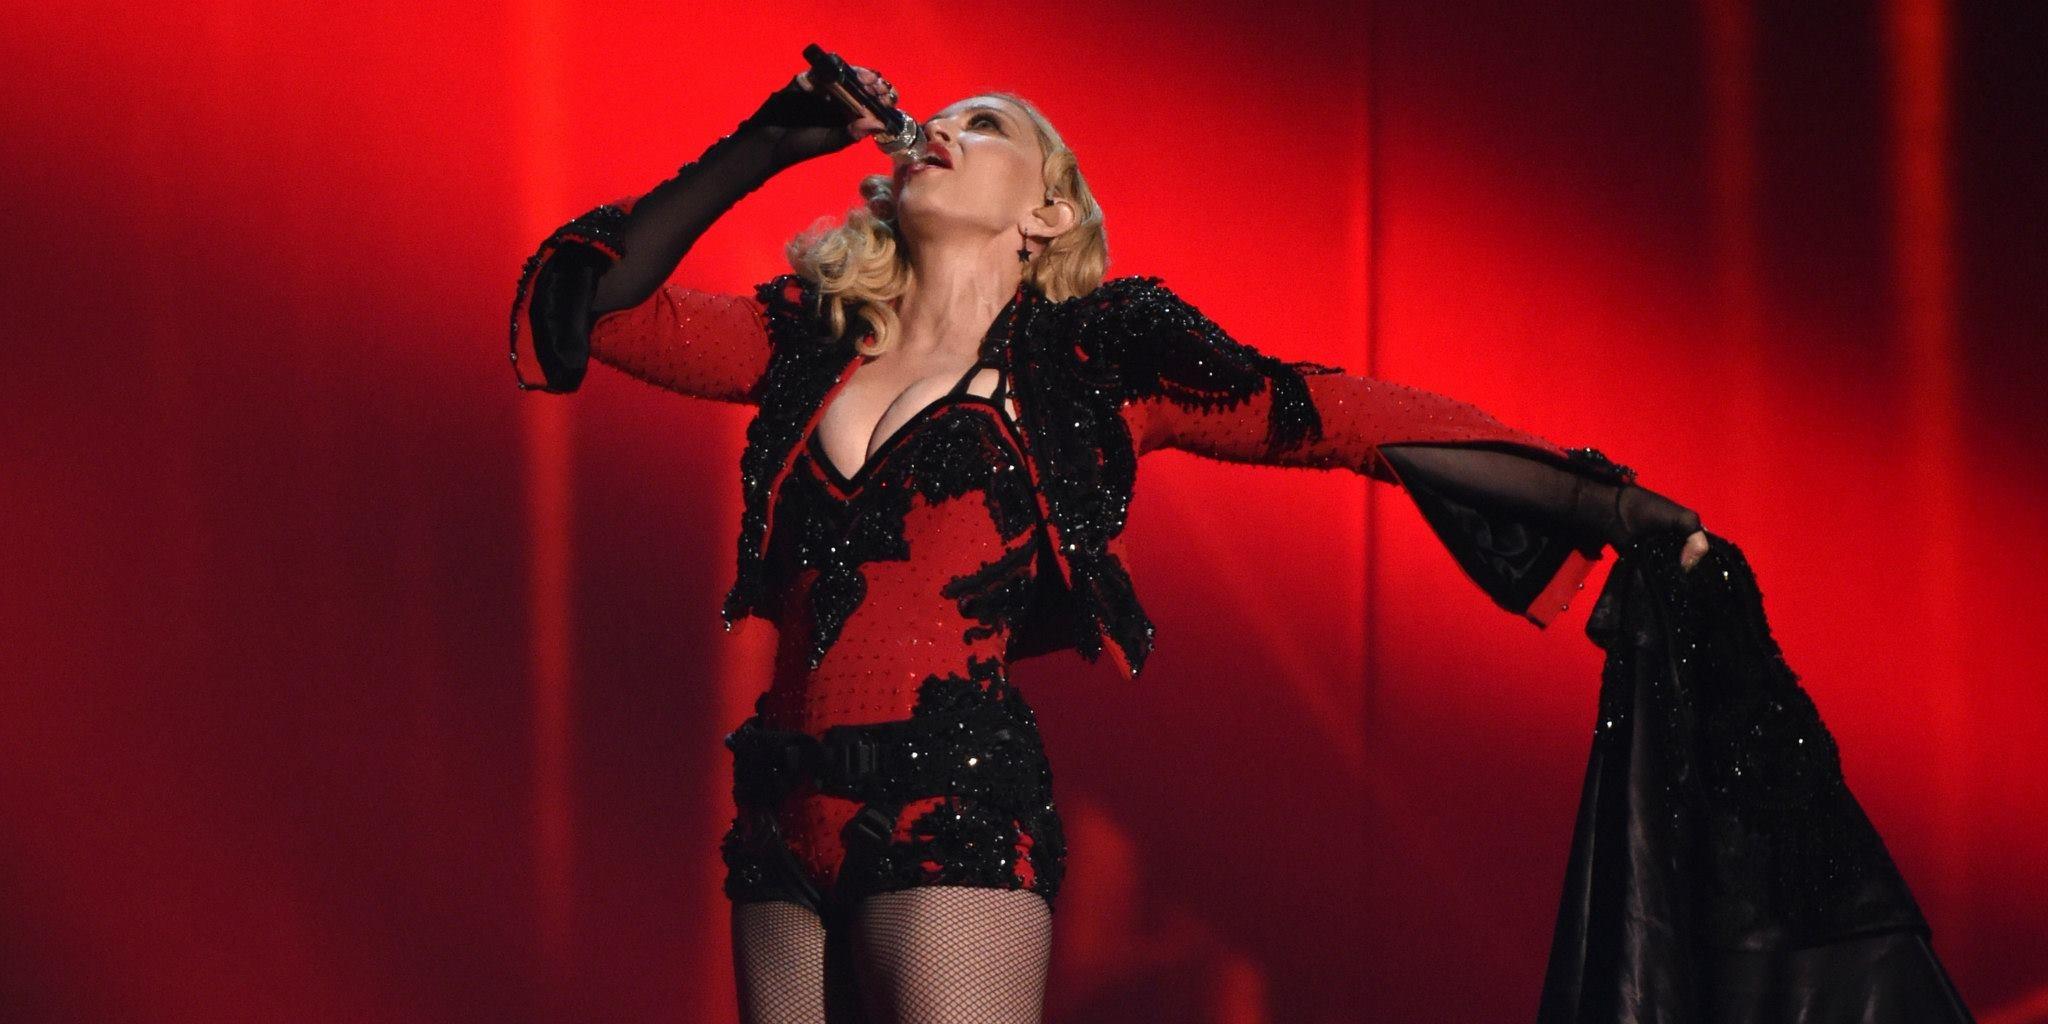 Singapore archbishop isn't happy about Madonna's show next week